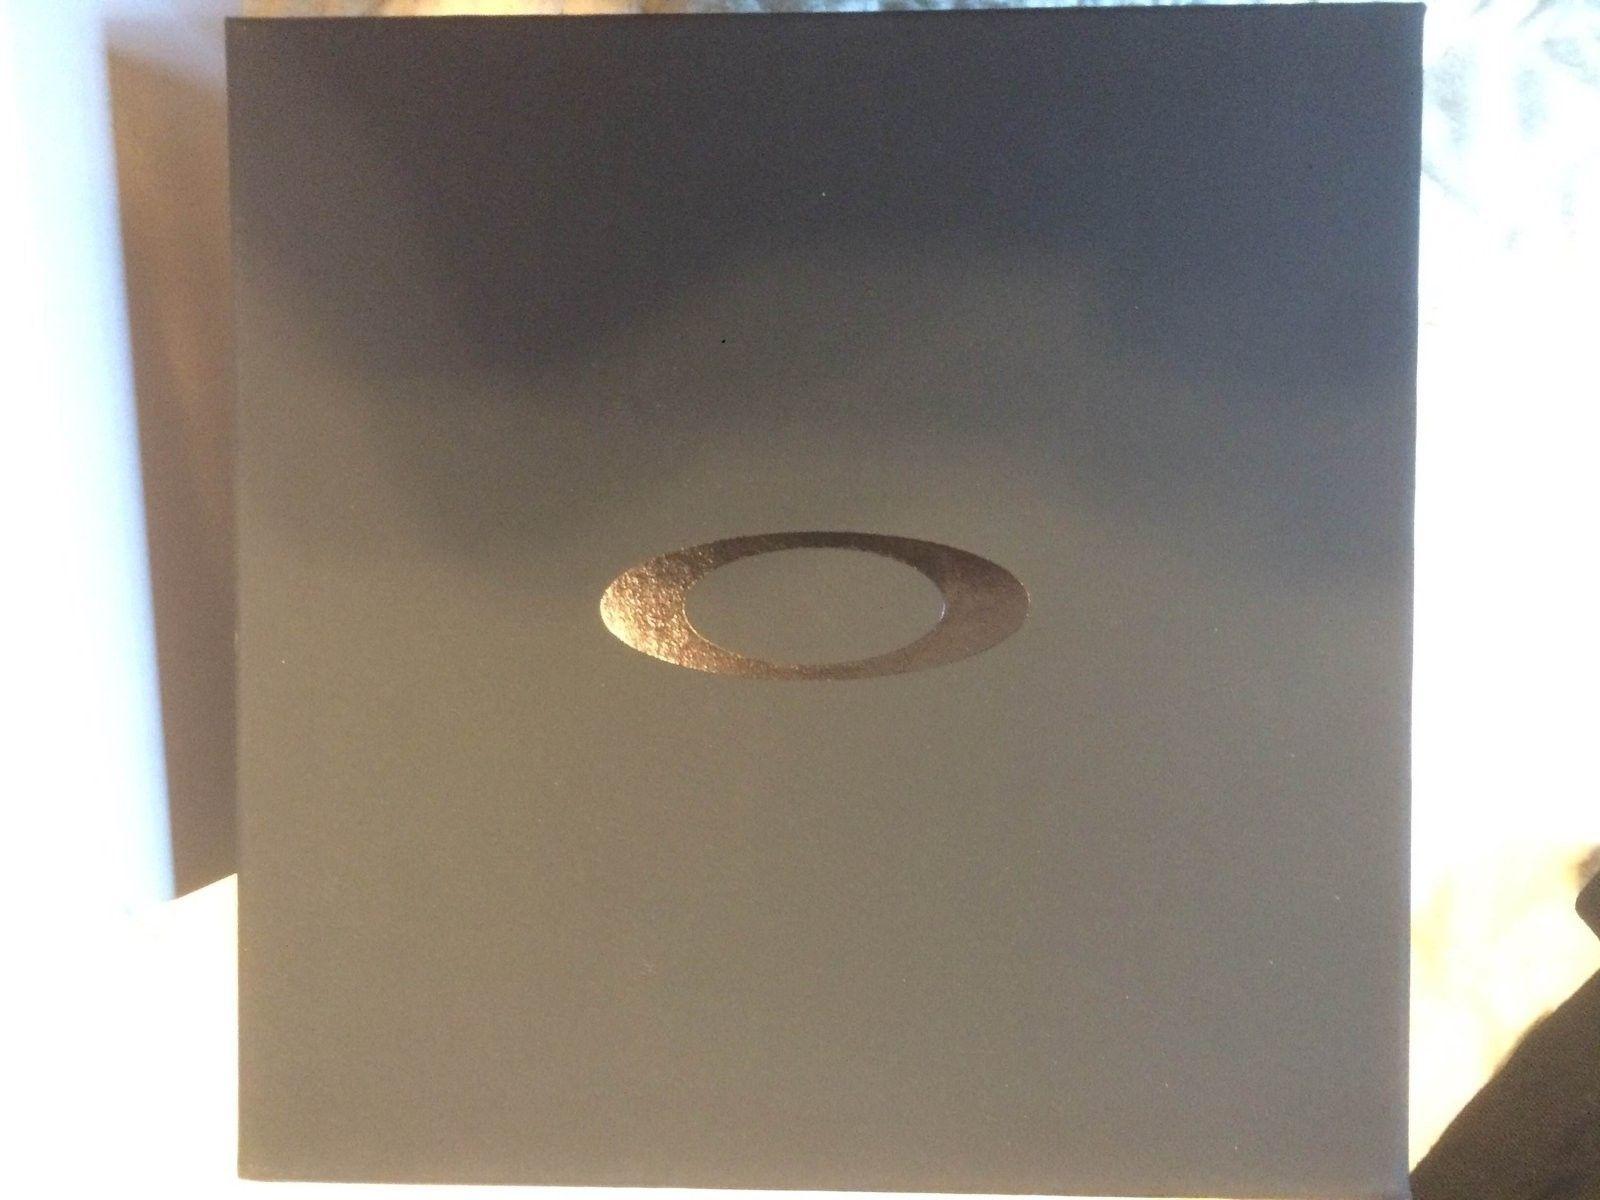 Carbon Carabiner - IMG_1409.JPG